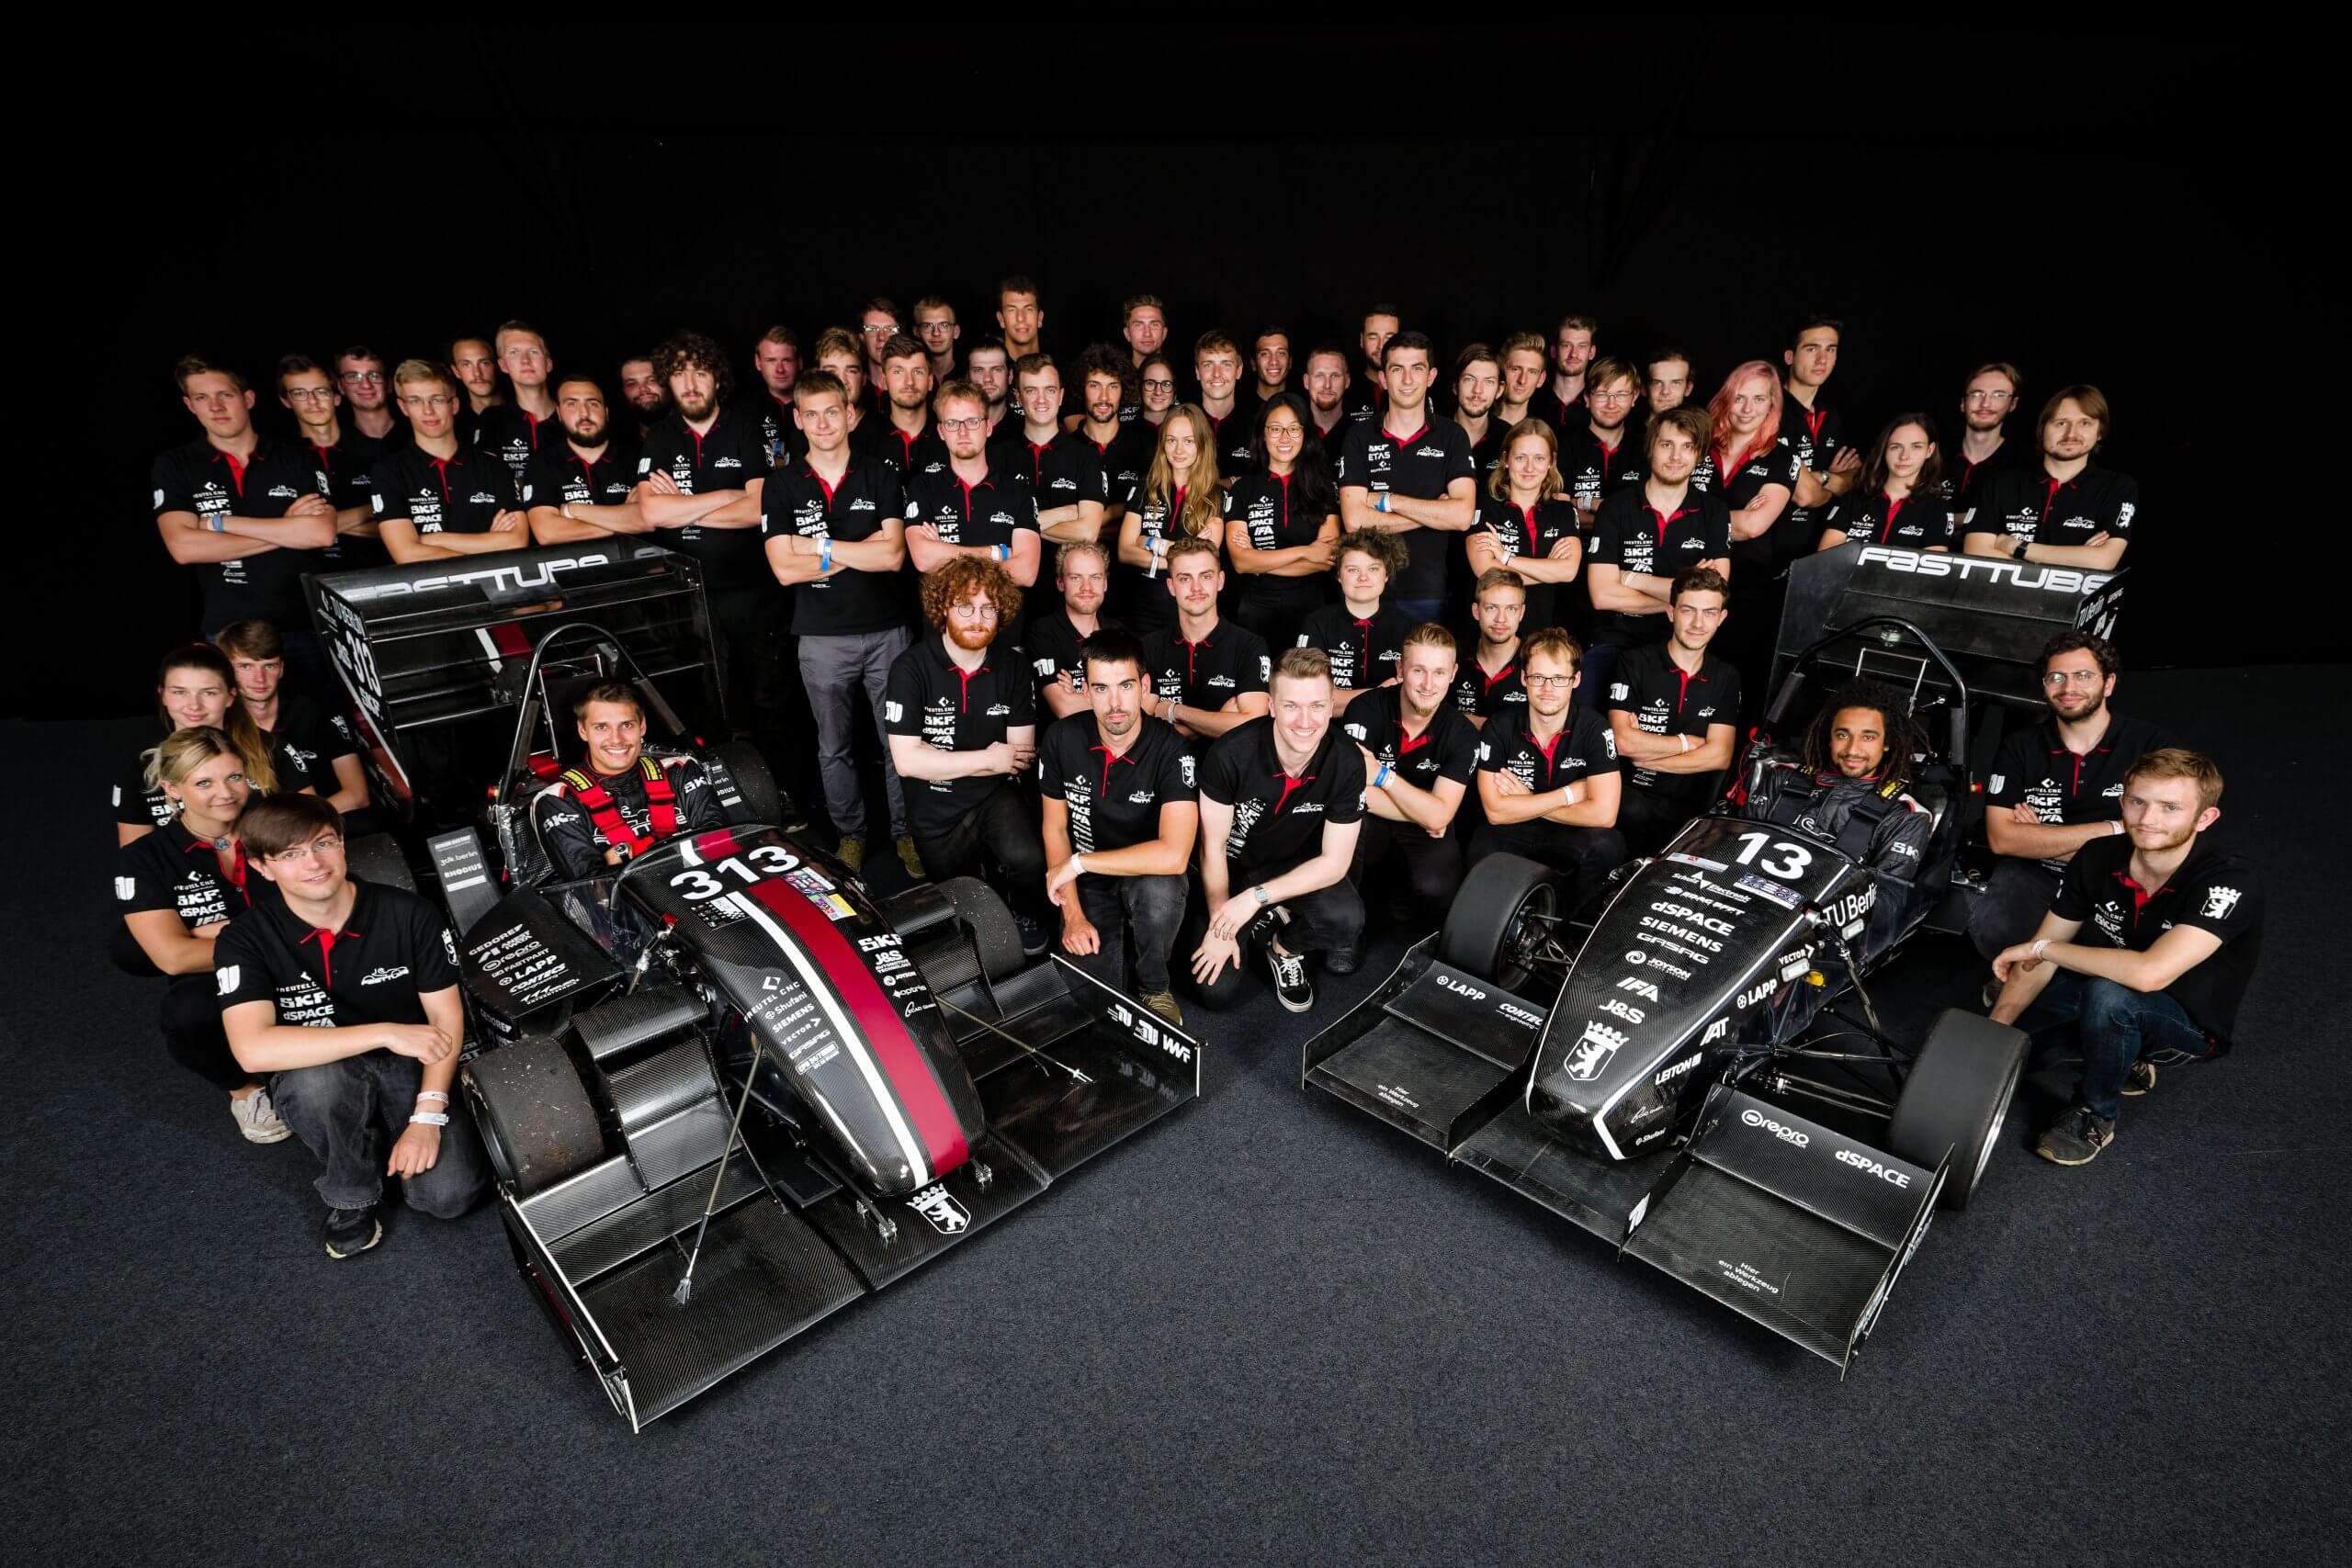 FT19 Team